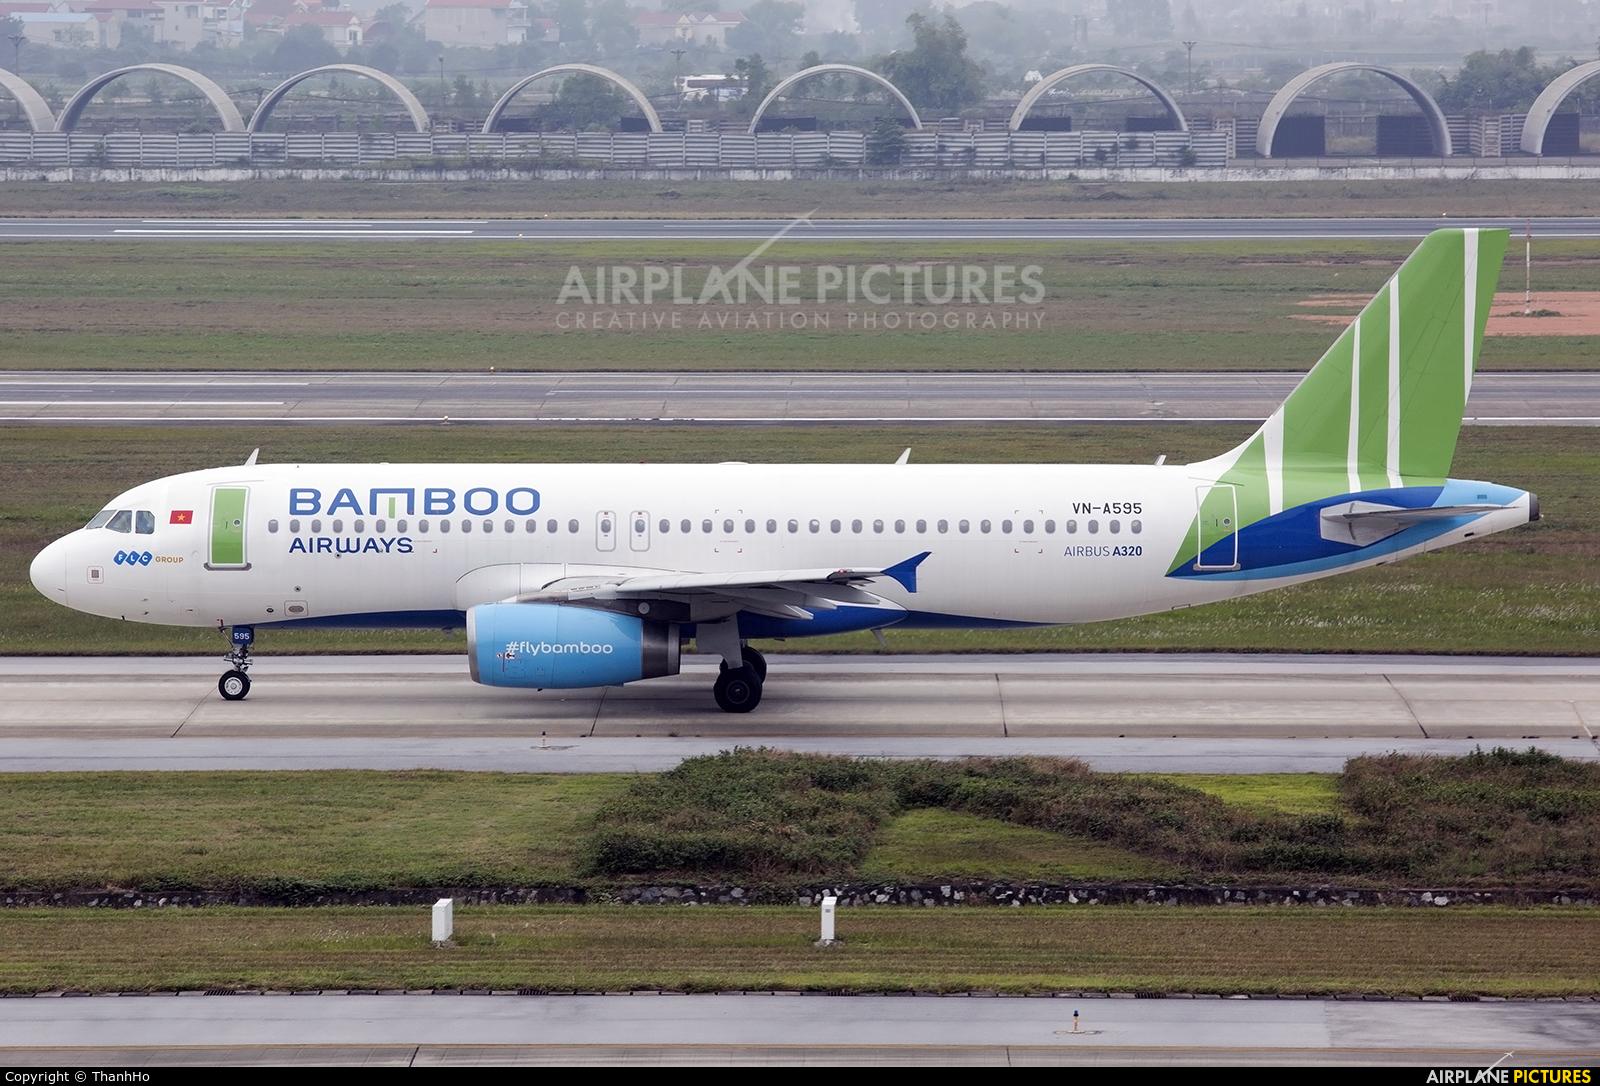 Bamboo Airways VN-A595 aircraft at Hanoi - Noi Bai